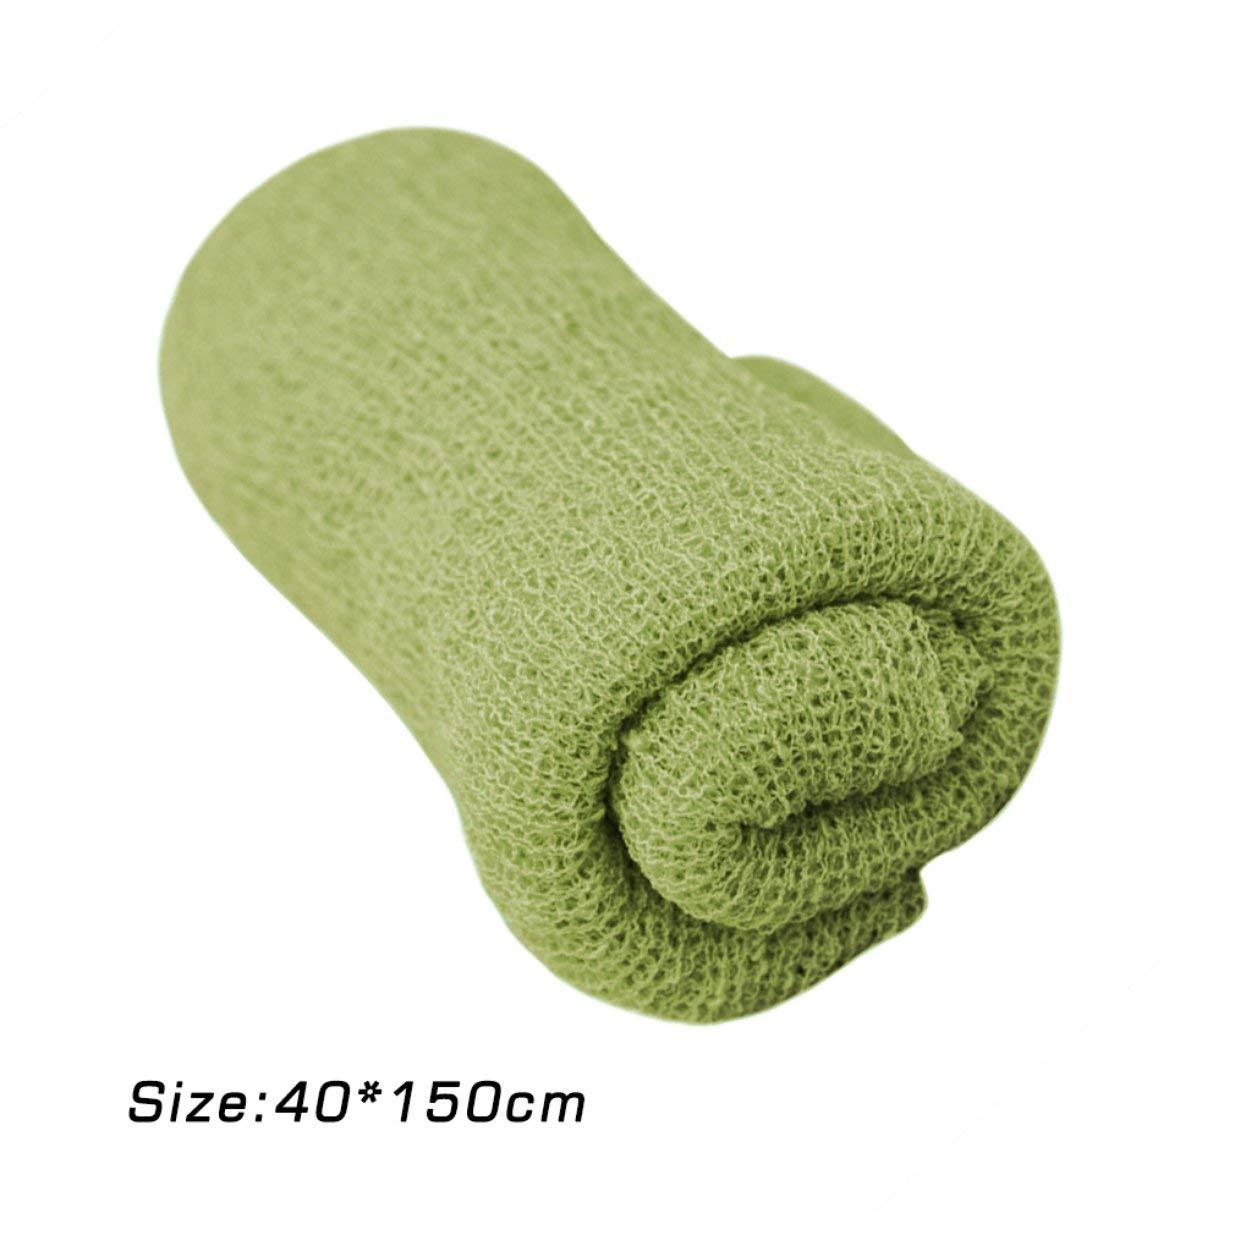 150cm Neugeborenes Baby Fotografie Requisiten Decke Rayon Stretch Knit Wraps 40